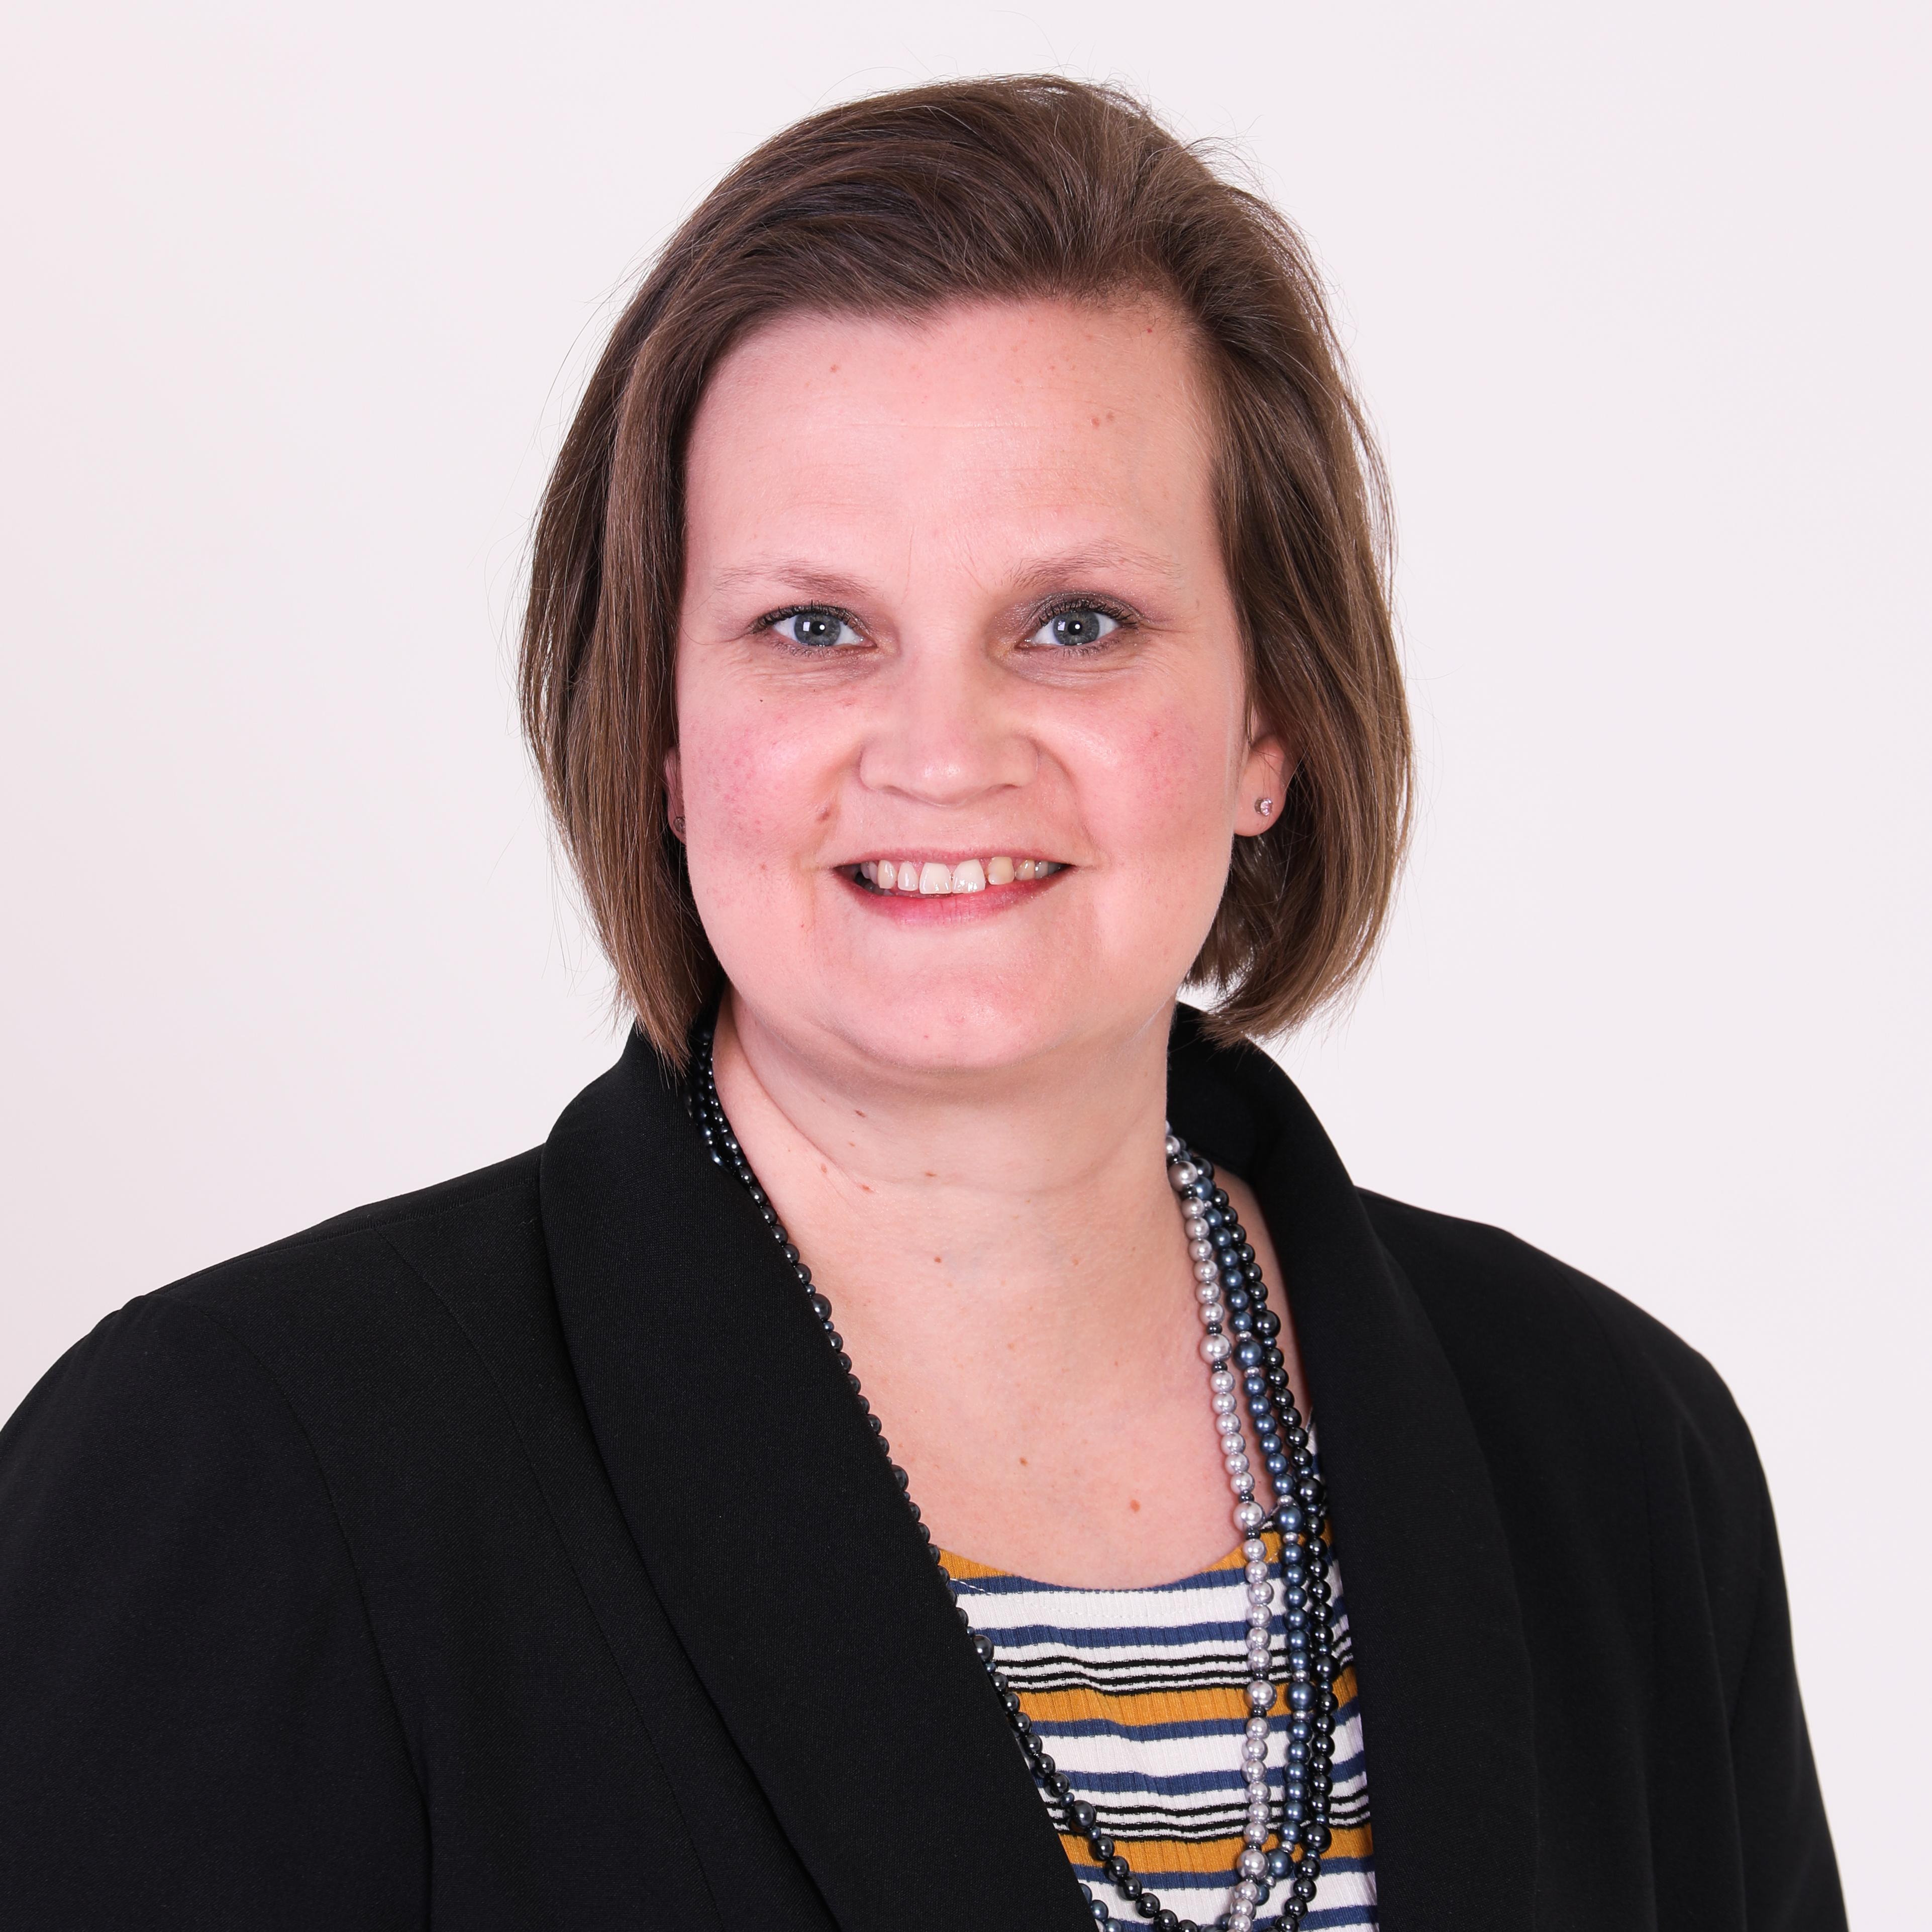 Megan Raulston